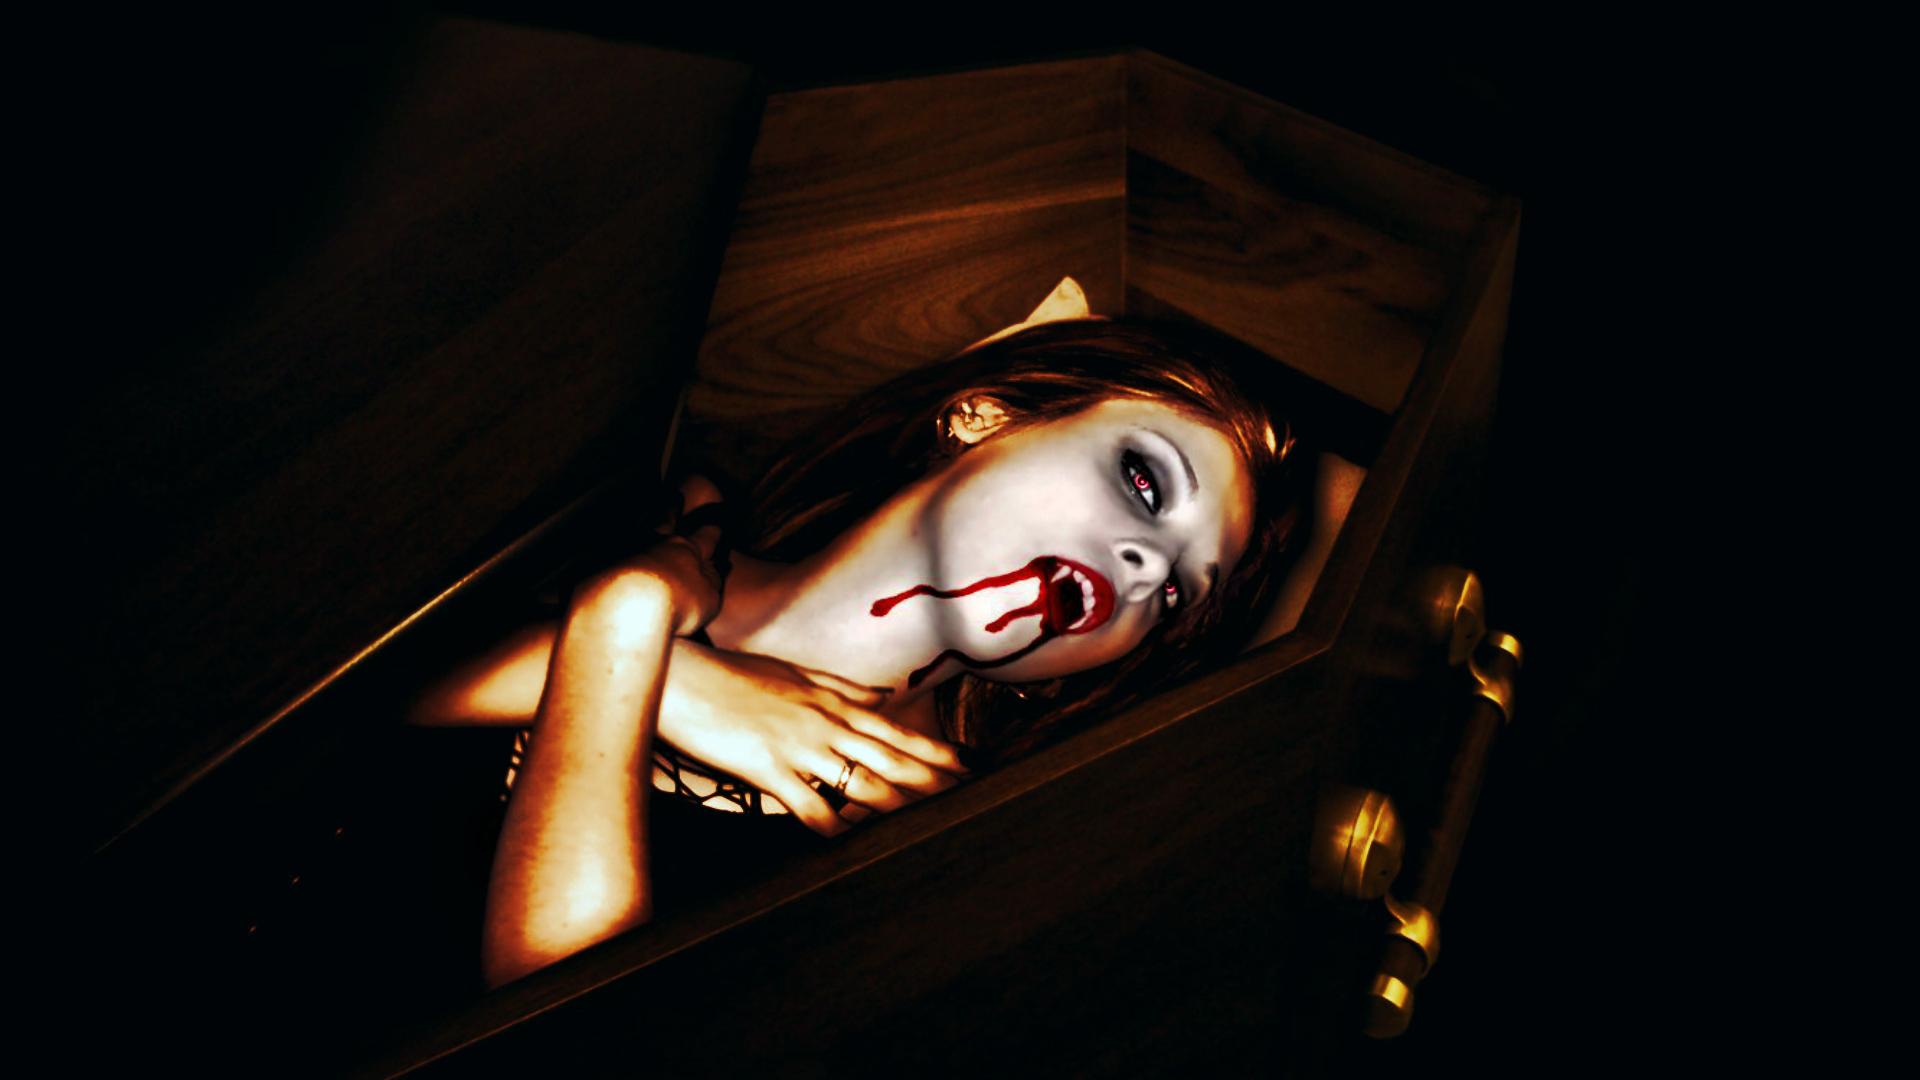 Vampire girl kiss video 3gp download sexy movie